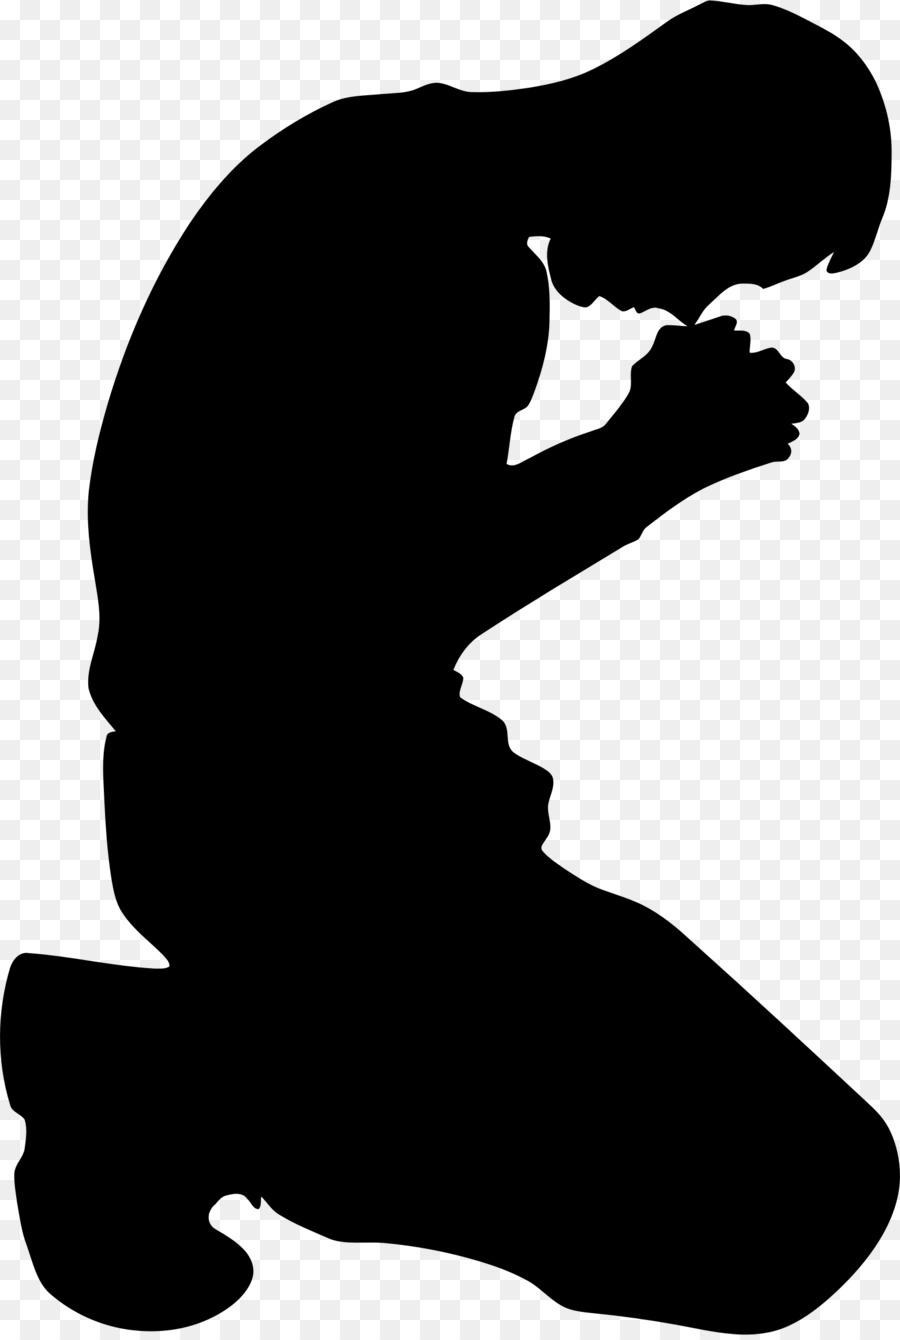 900x1340 Praying Hands Kneeling Silhouette Clip Art